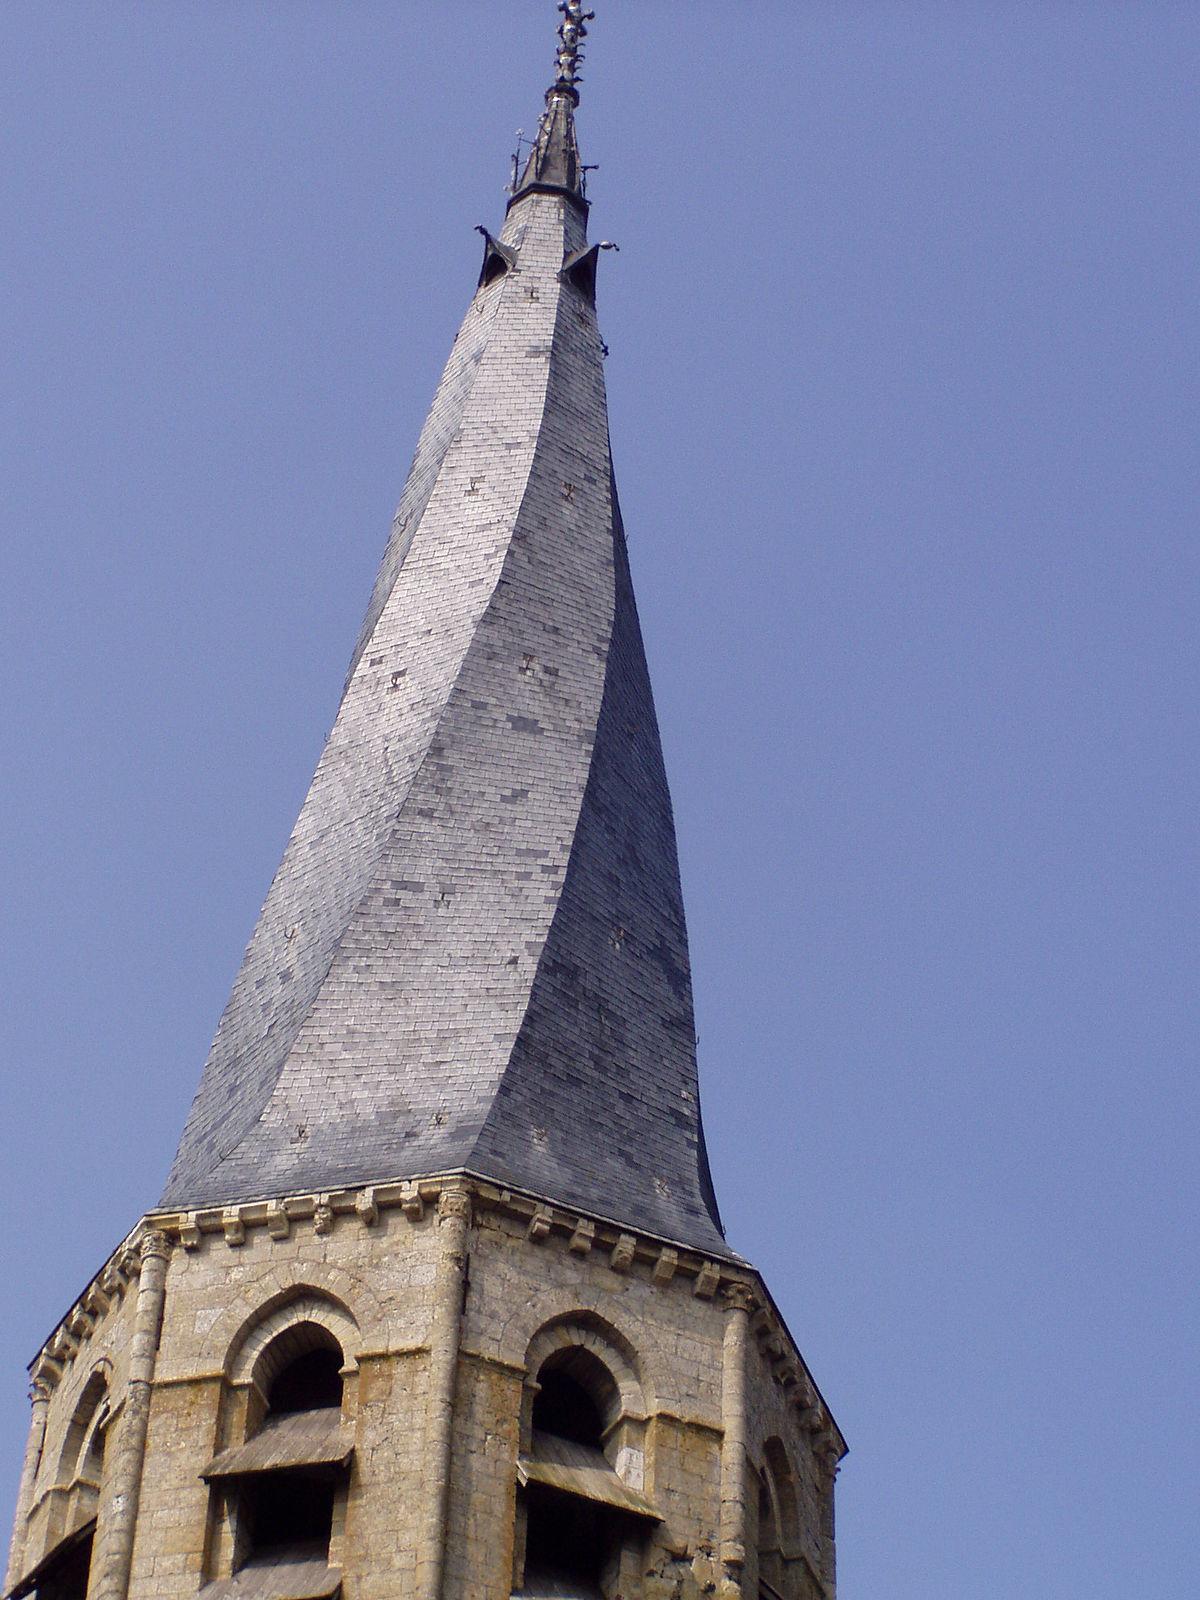 Clocher tors wiktionnaire for Etymologie architecture